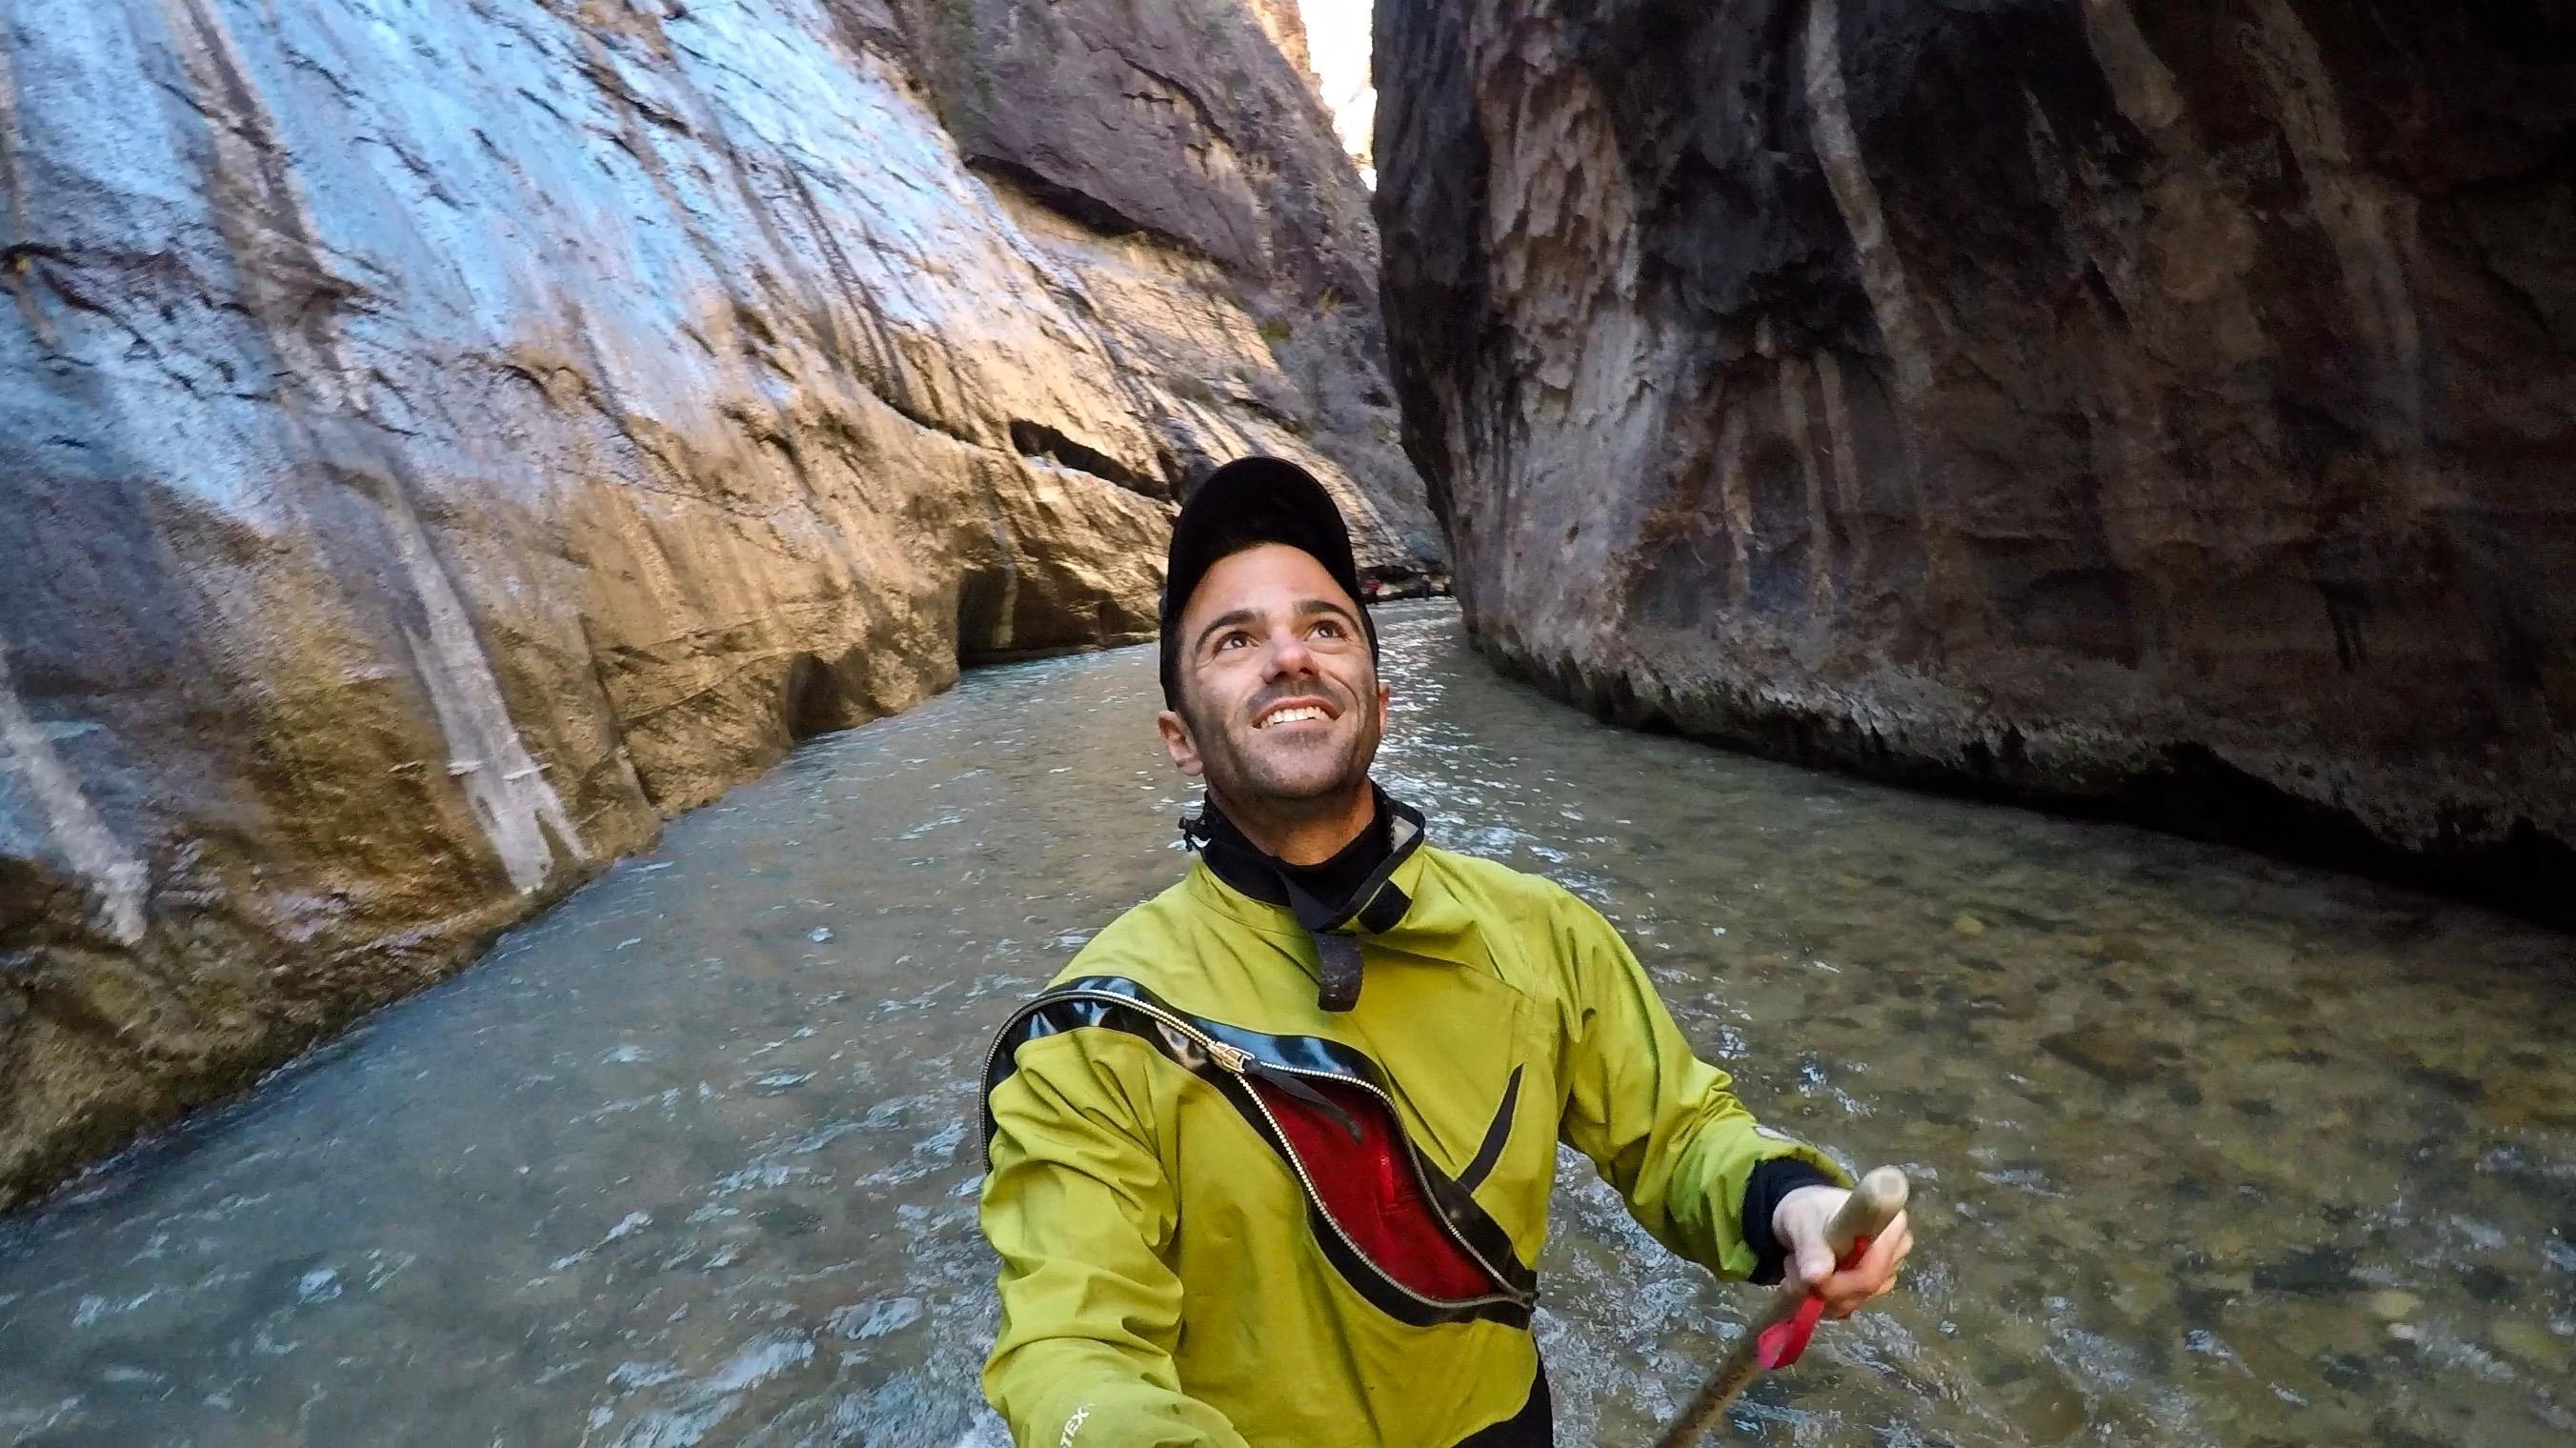 Zion National Park Narrows Hike Justin Walter